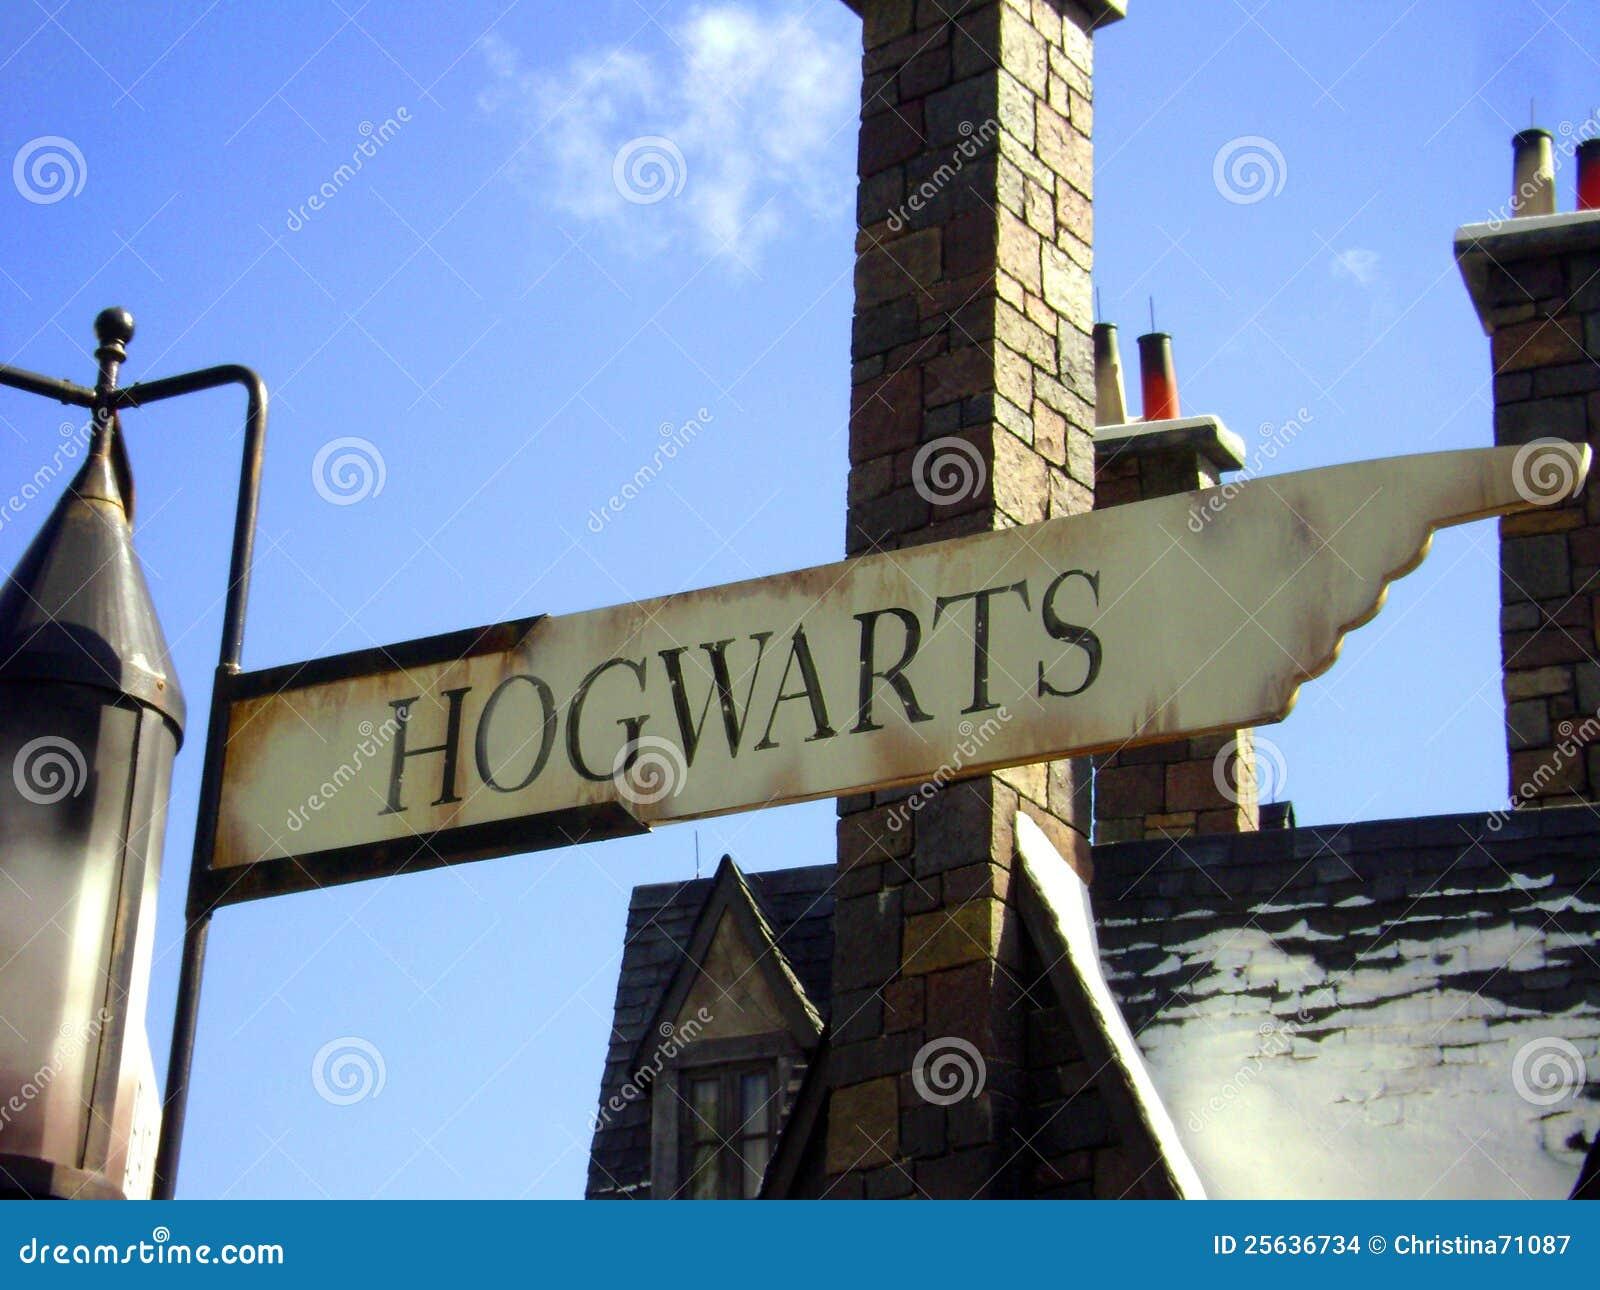 Hogwarts符号